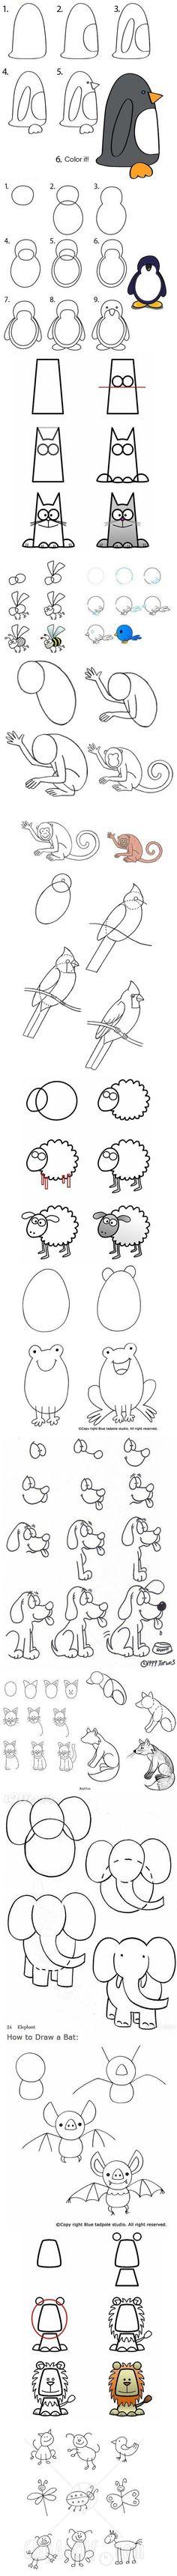 How to draw animals | CutePinky SocialBookmarking